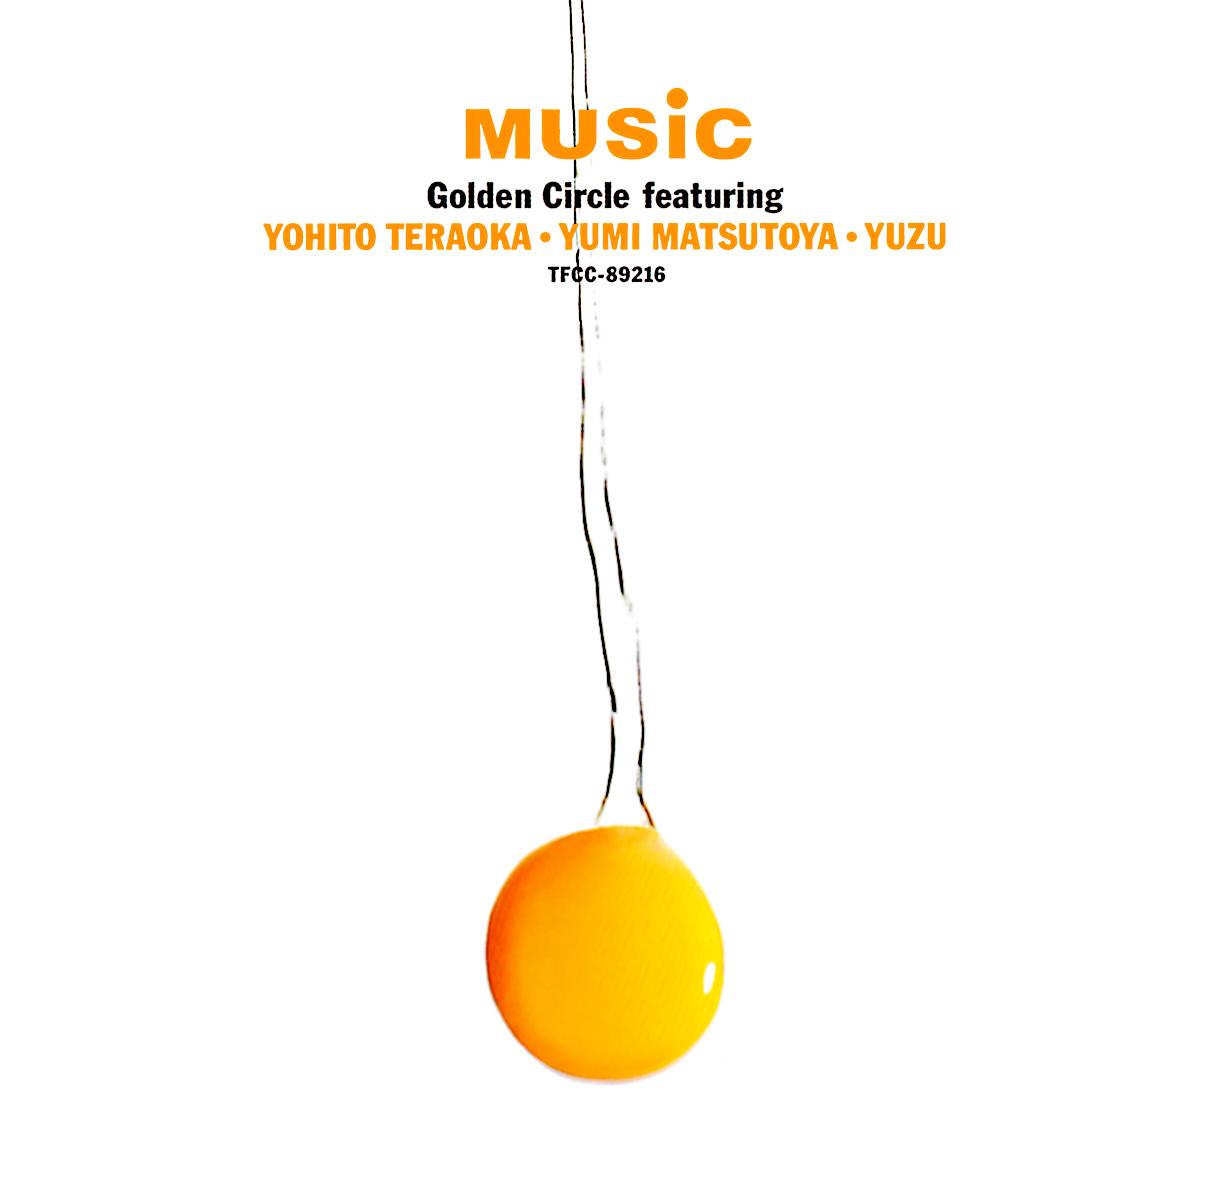 Golden Circle Feat. 寺岡呼人, 松任谷由実 & ゆず『ミュージック』の高画質ジャケット画像